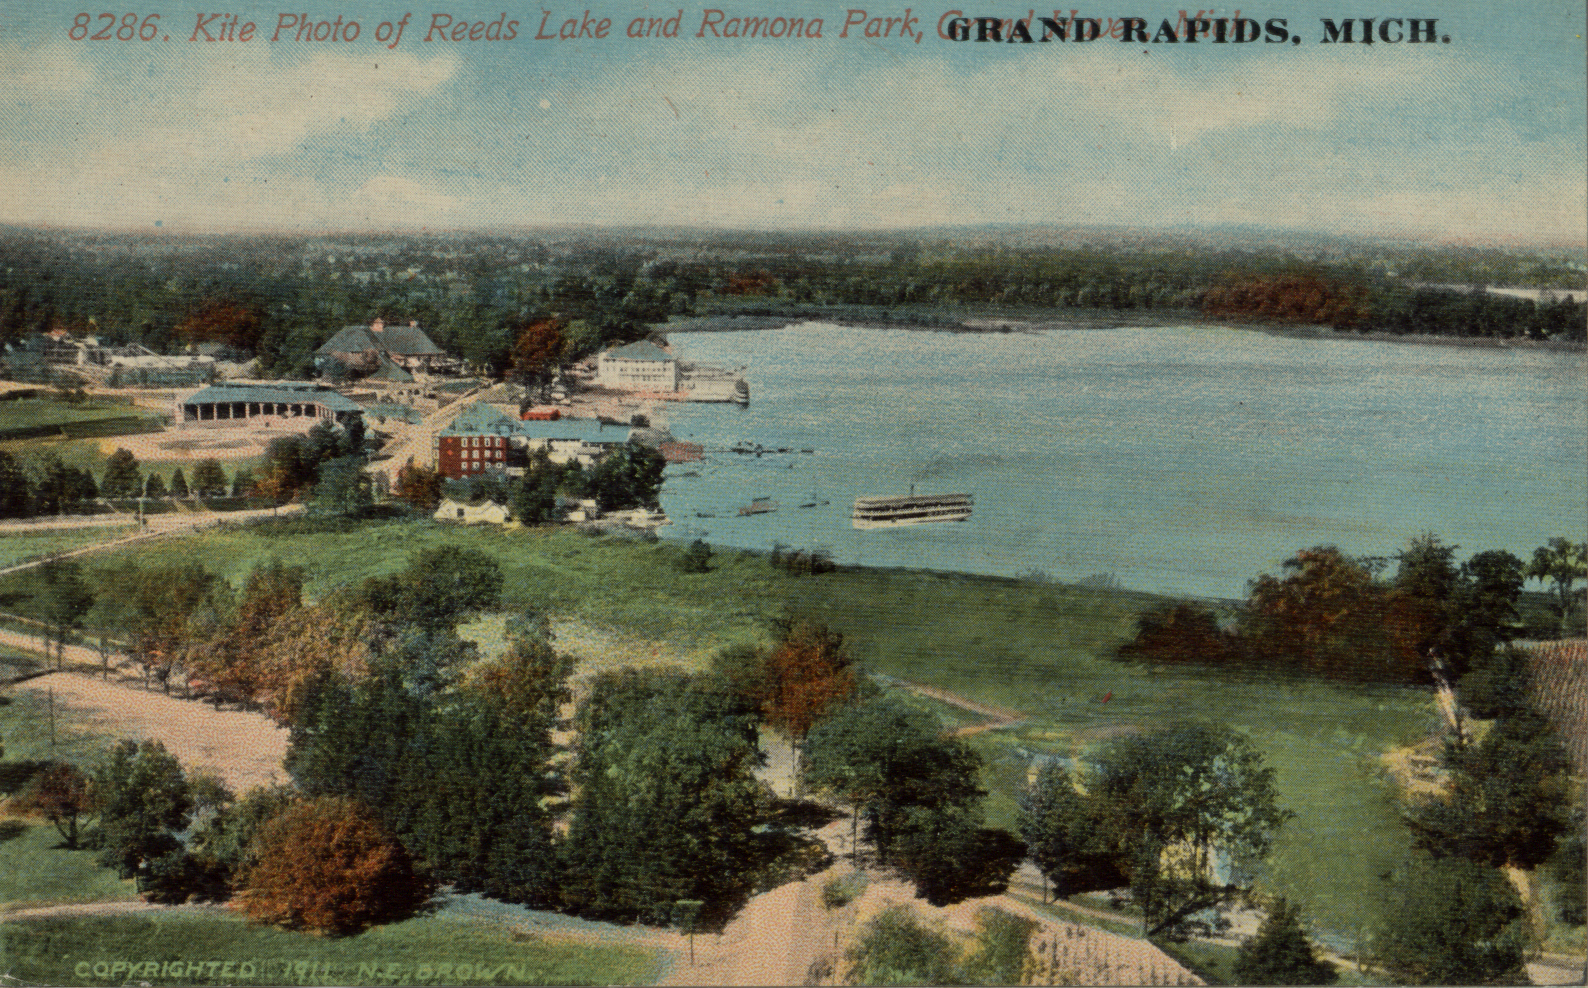 East Grand Rapids Apartment Buildings